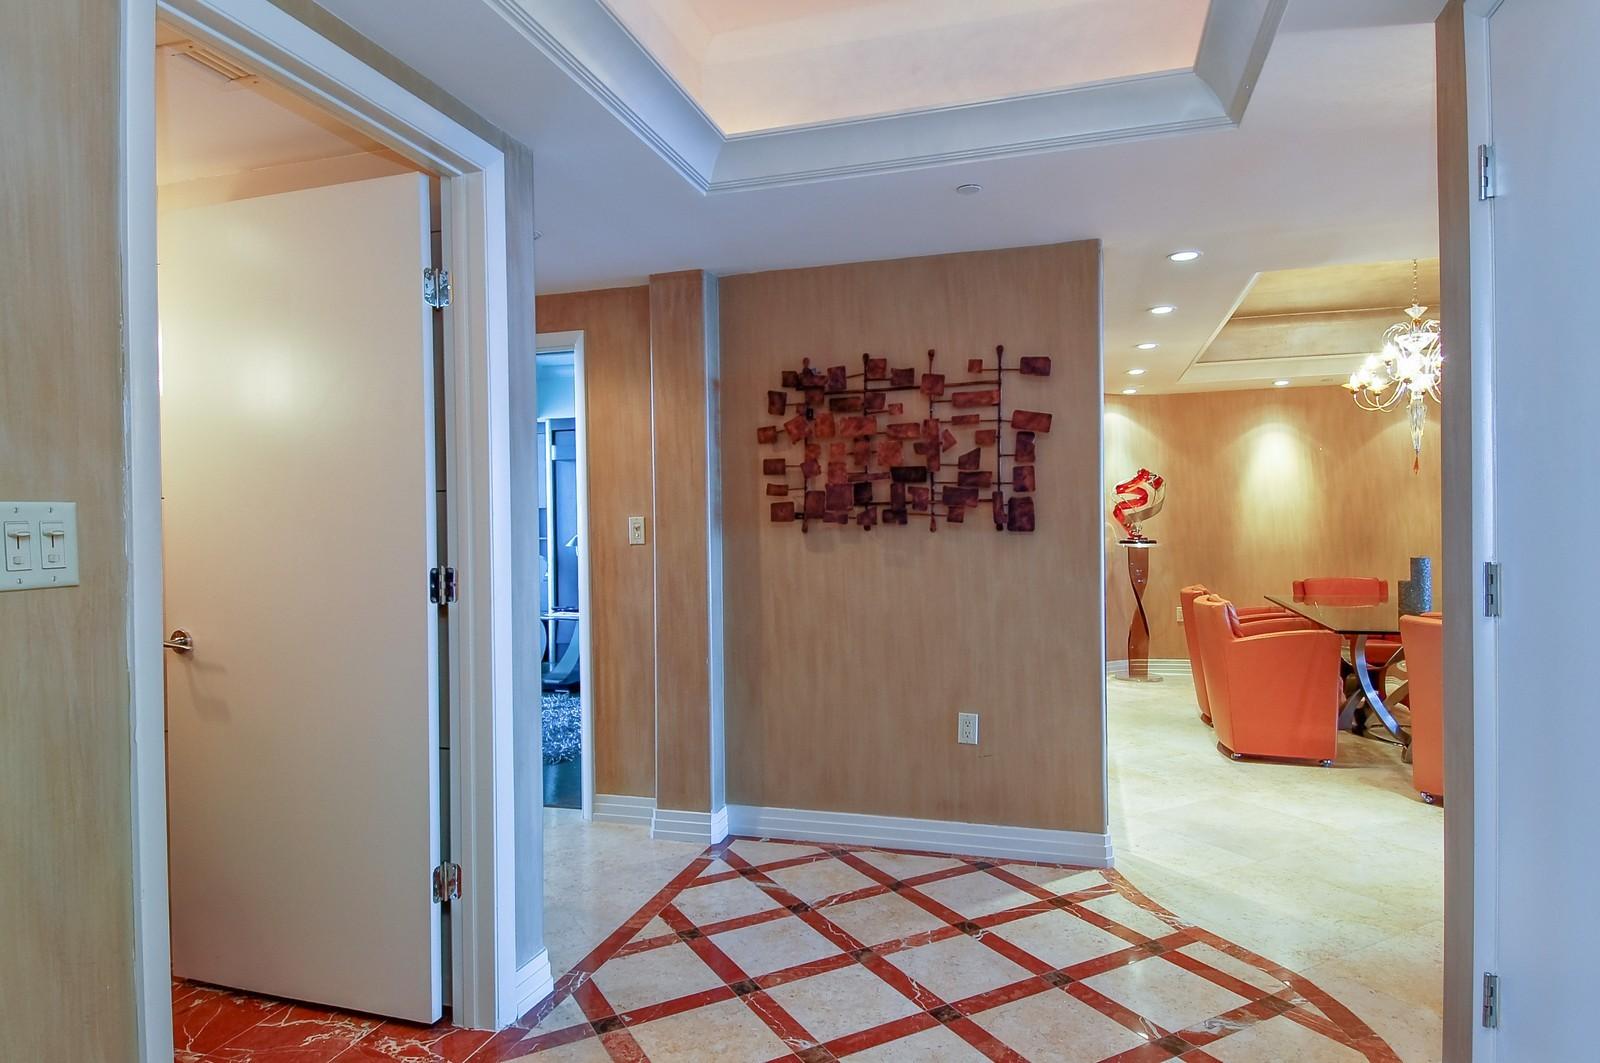 Real Estate Photography - 1600 S Ocean Blvd, Apt 802, Pompano Beach, FL, 33062 - Foyer